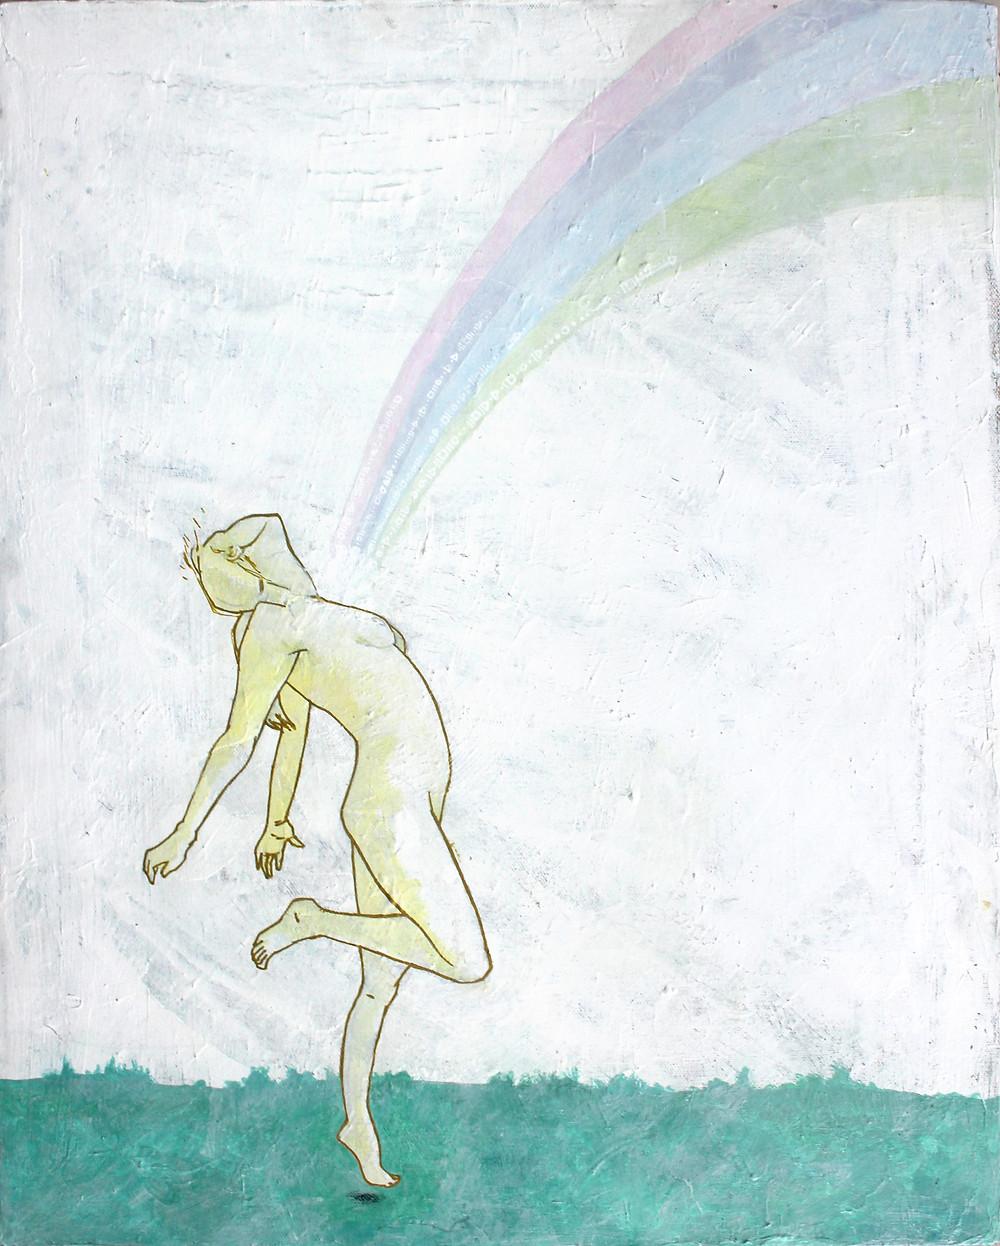 Rainbow Wave Ascension